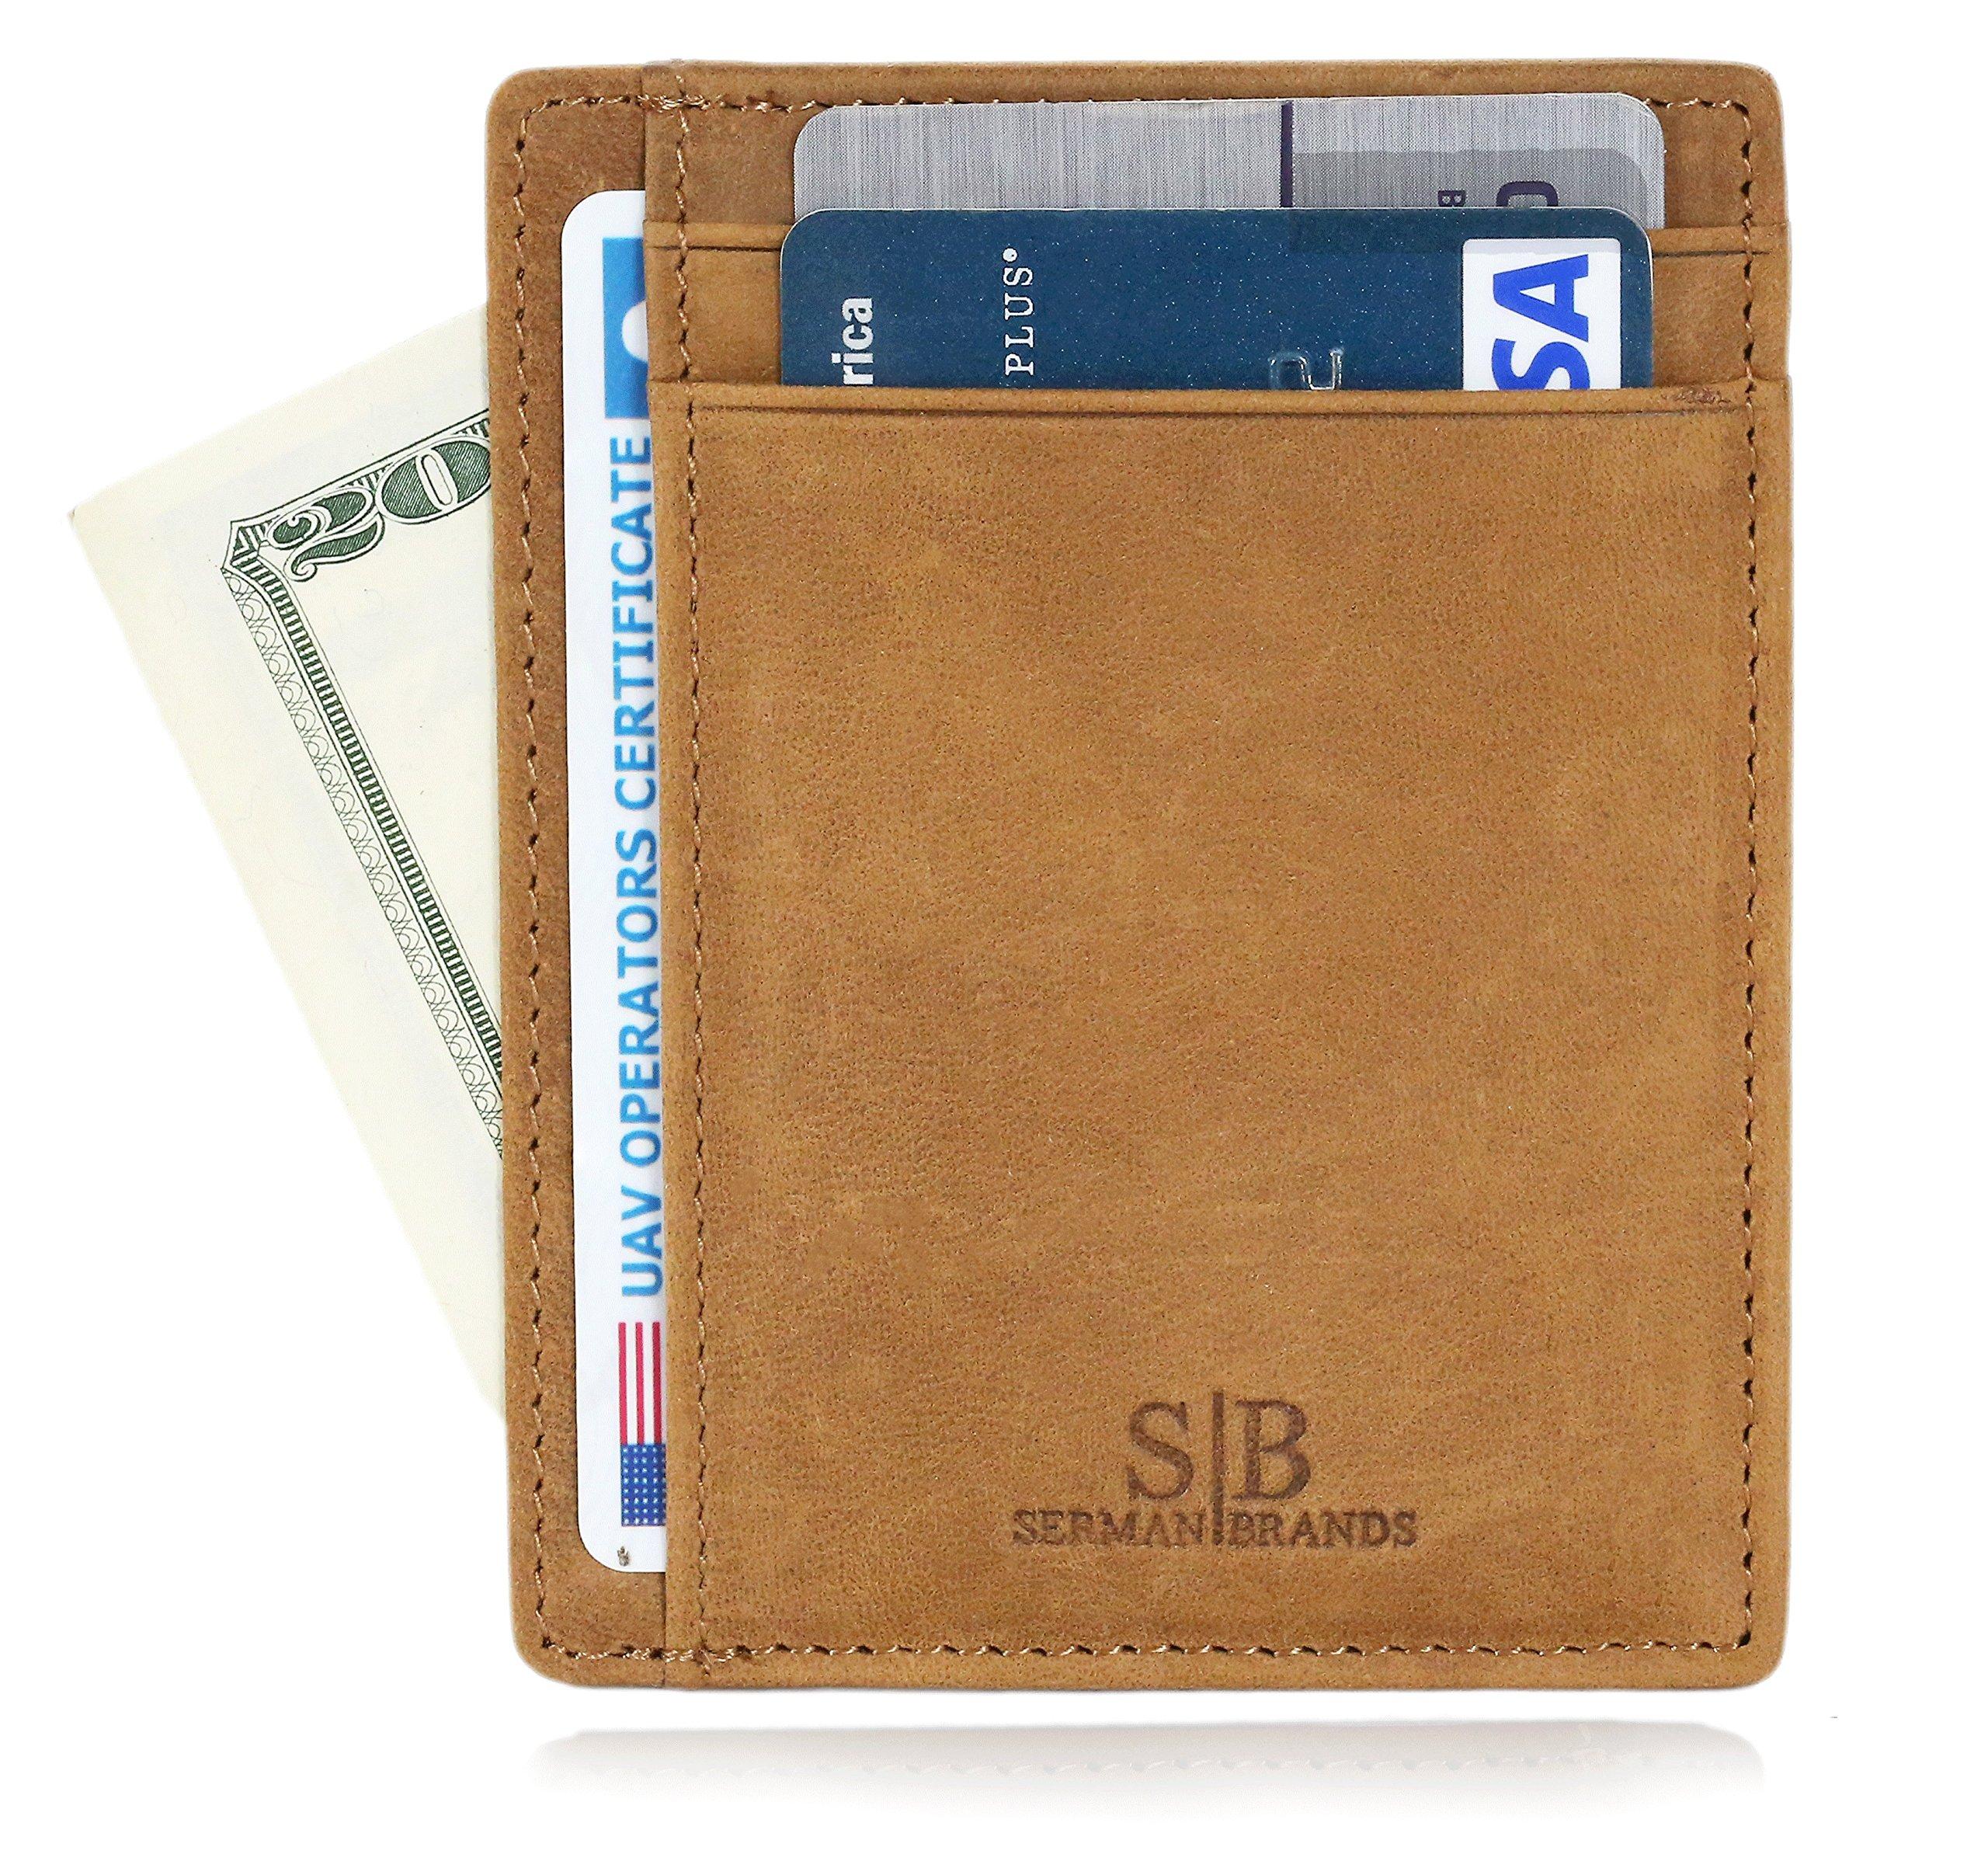 SERMAN BRANDS - Credit Card Holder RFID Blocking Leather Slim Wallet, Minimalist Front Pocket Wallets For Men Made From Full Grain Leather (Camel)